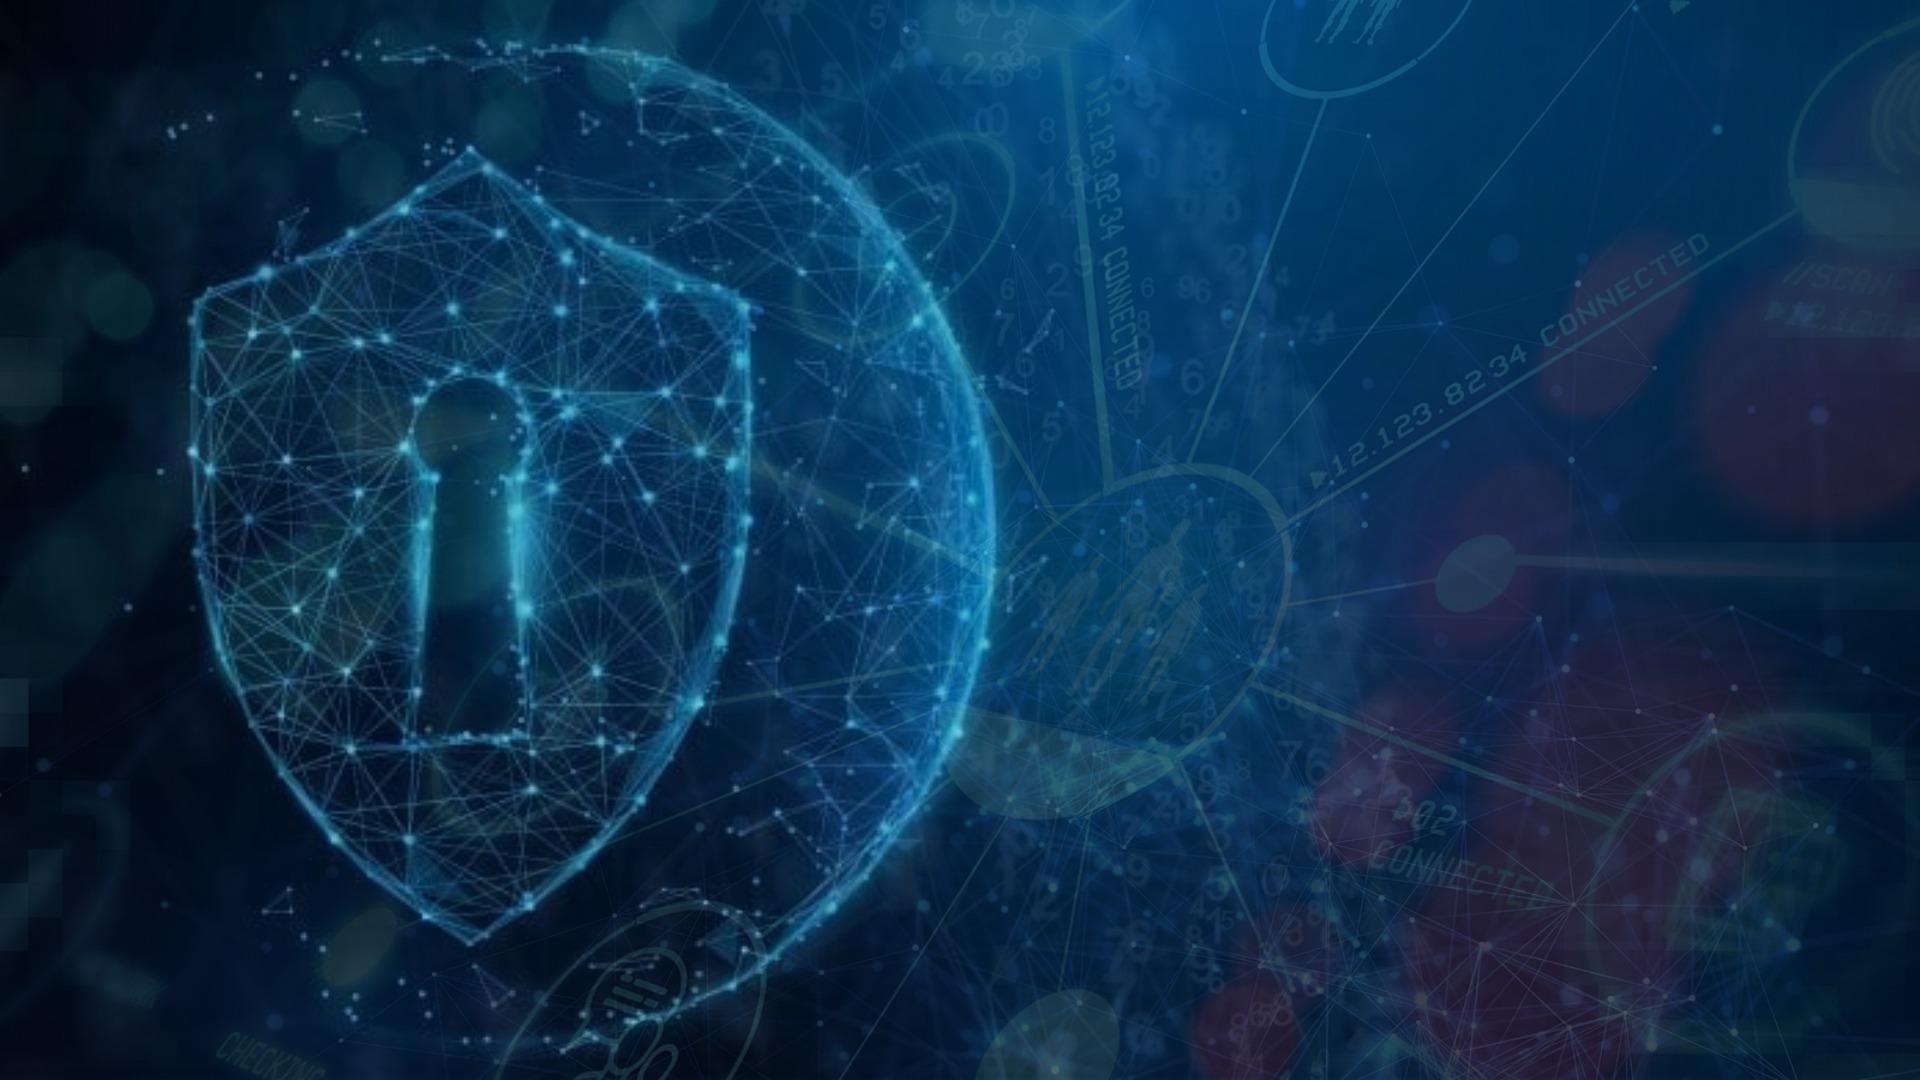 Security 3D illustration